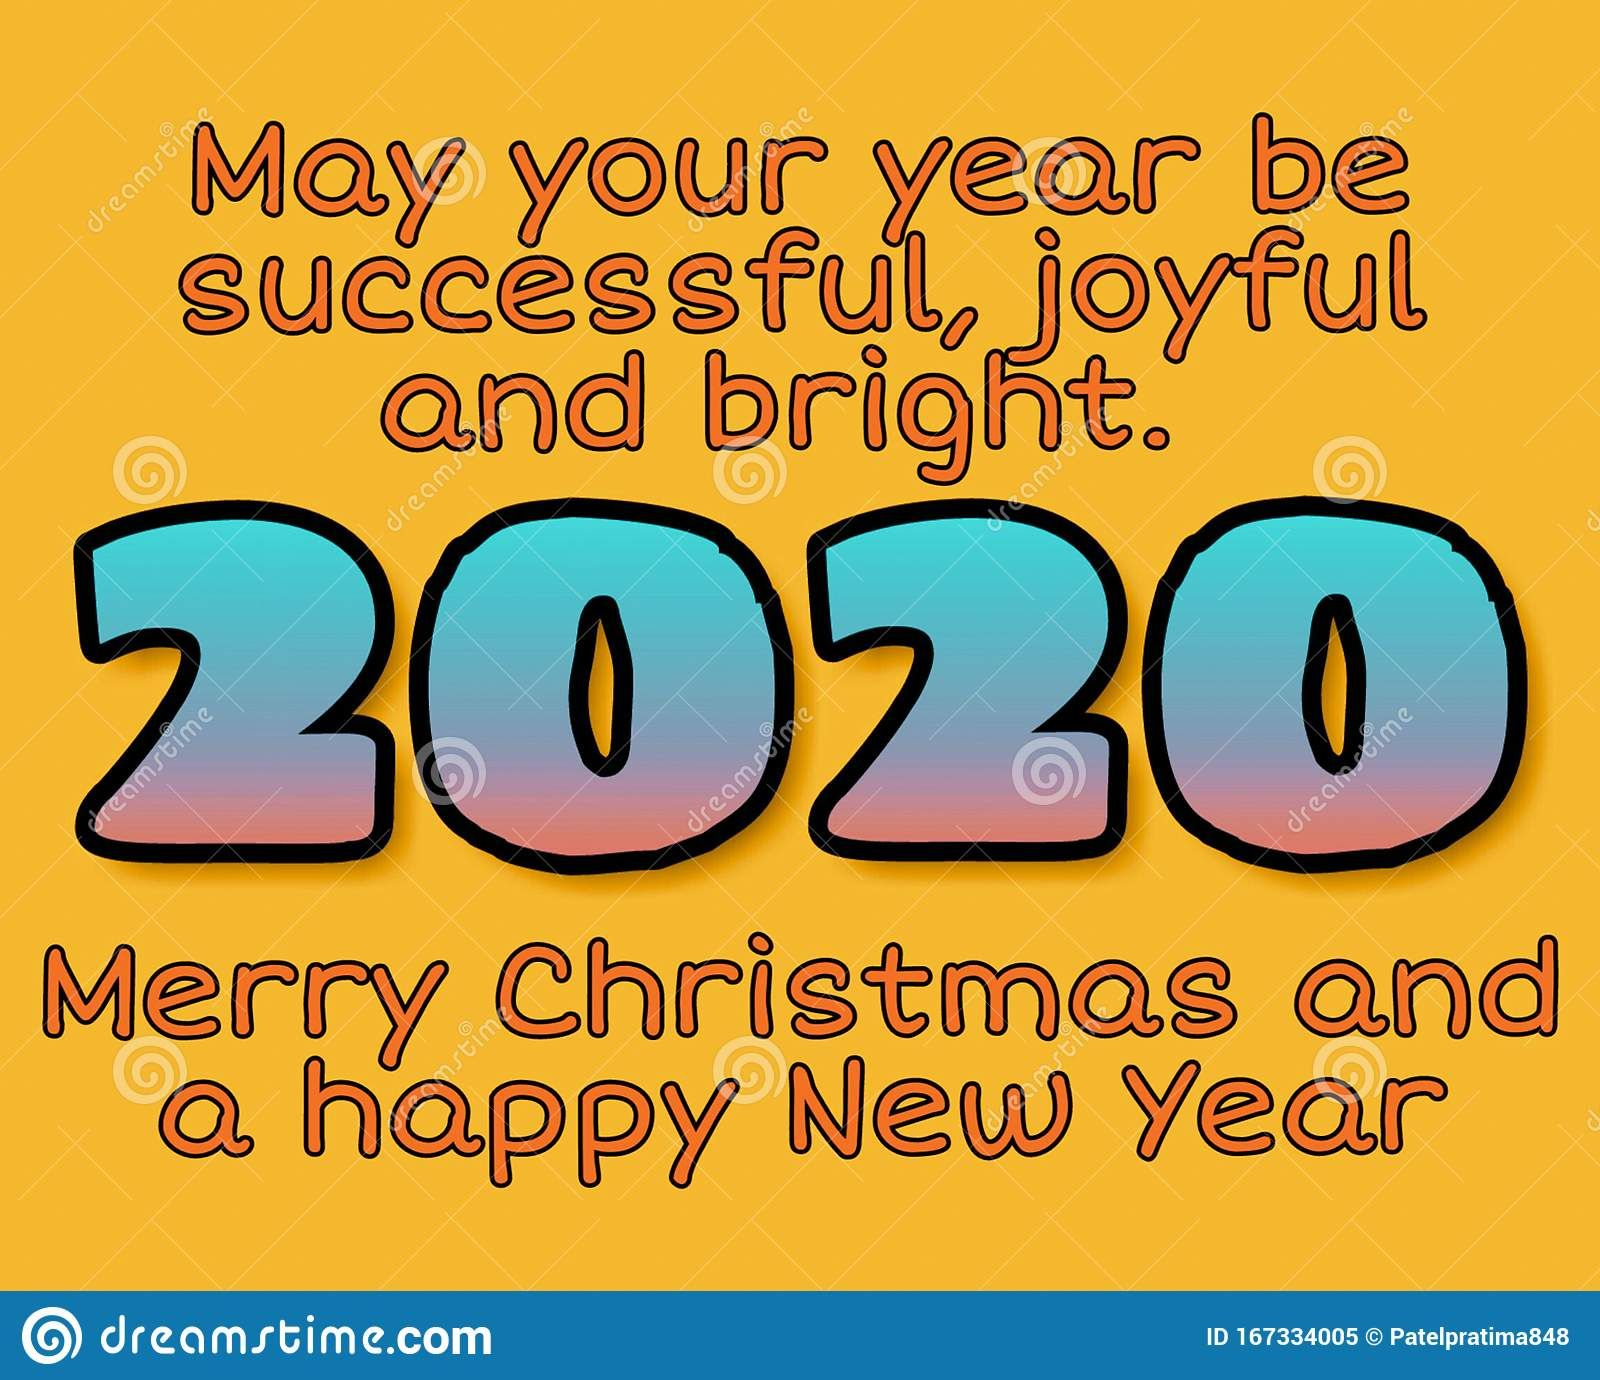 Happy New Year 2020 Happy New Year Greetings Happy New Year 2020 Happy New Year